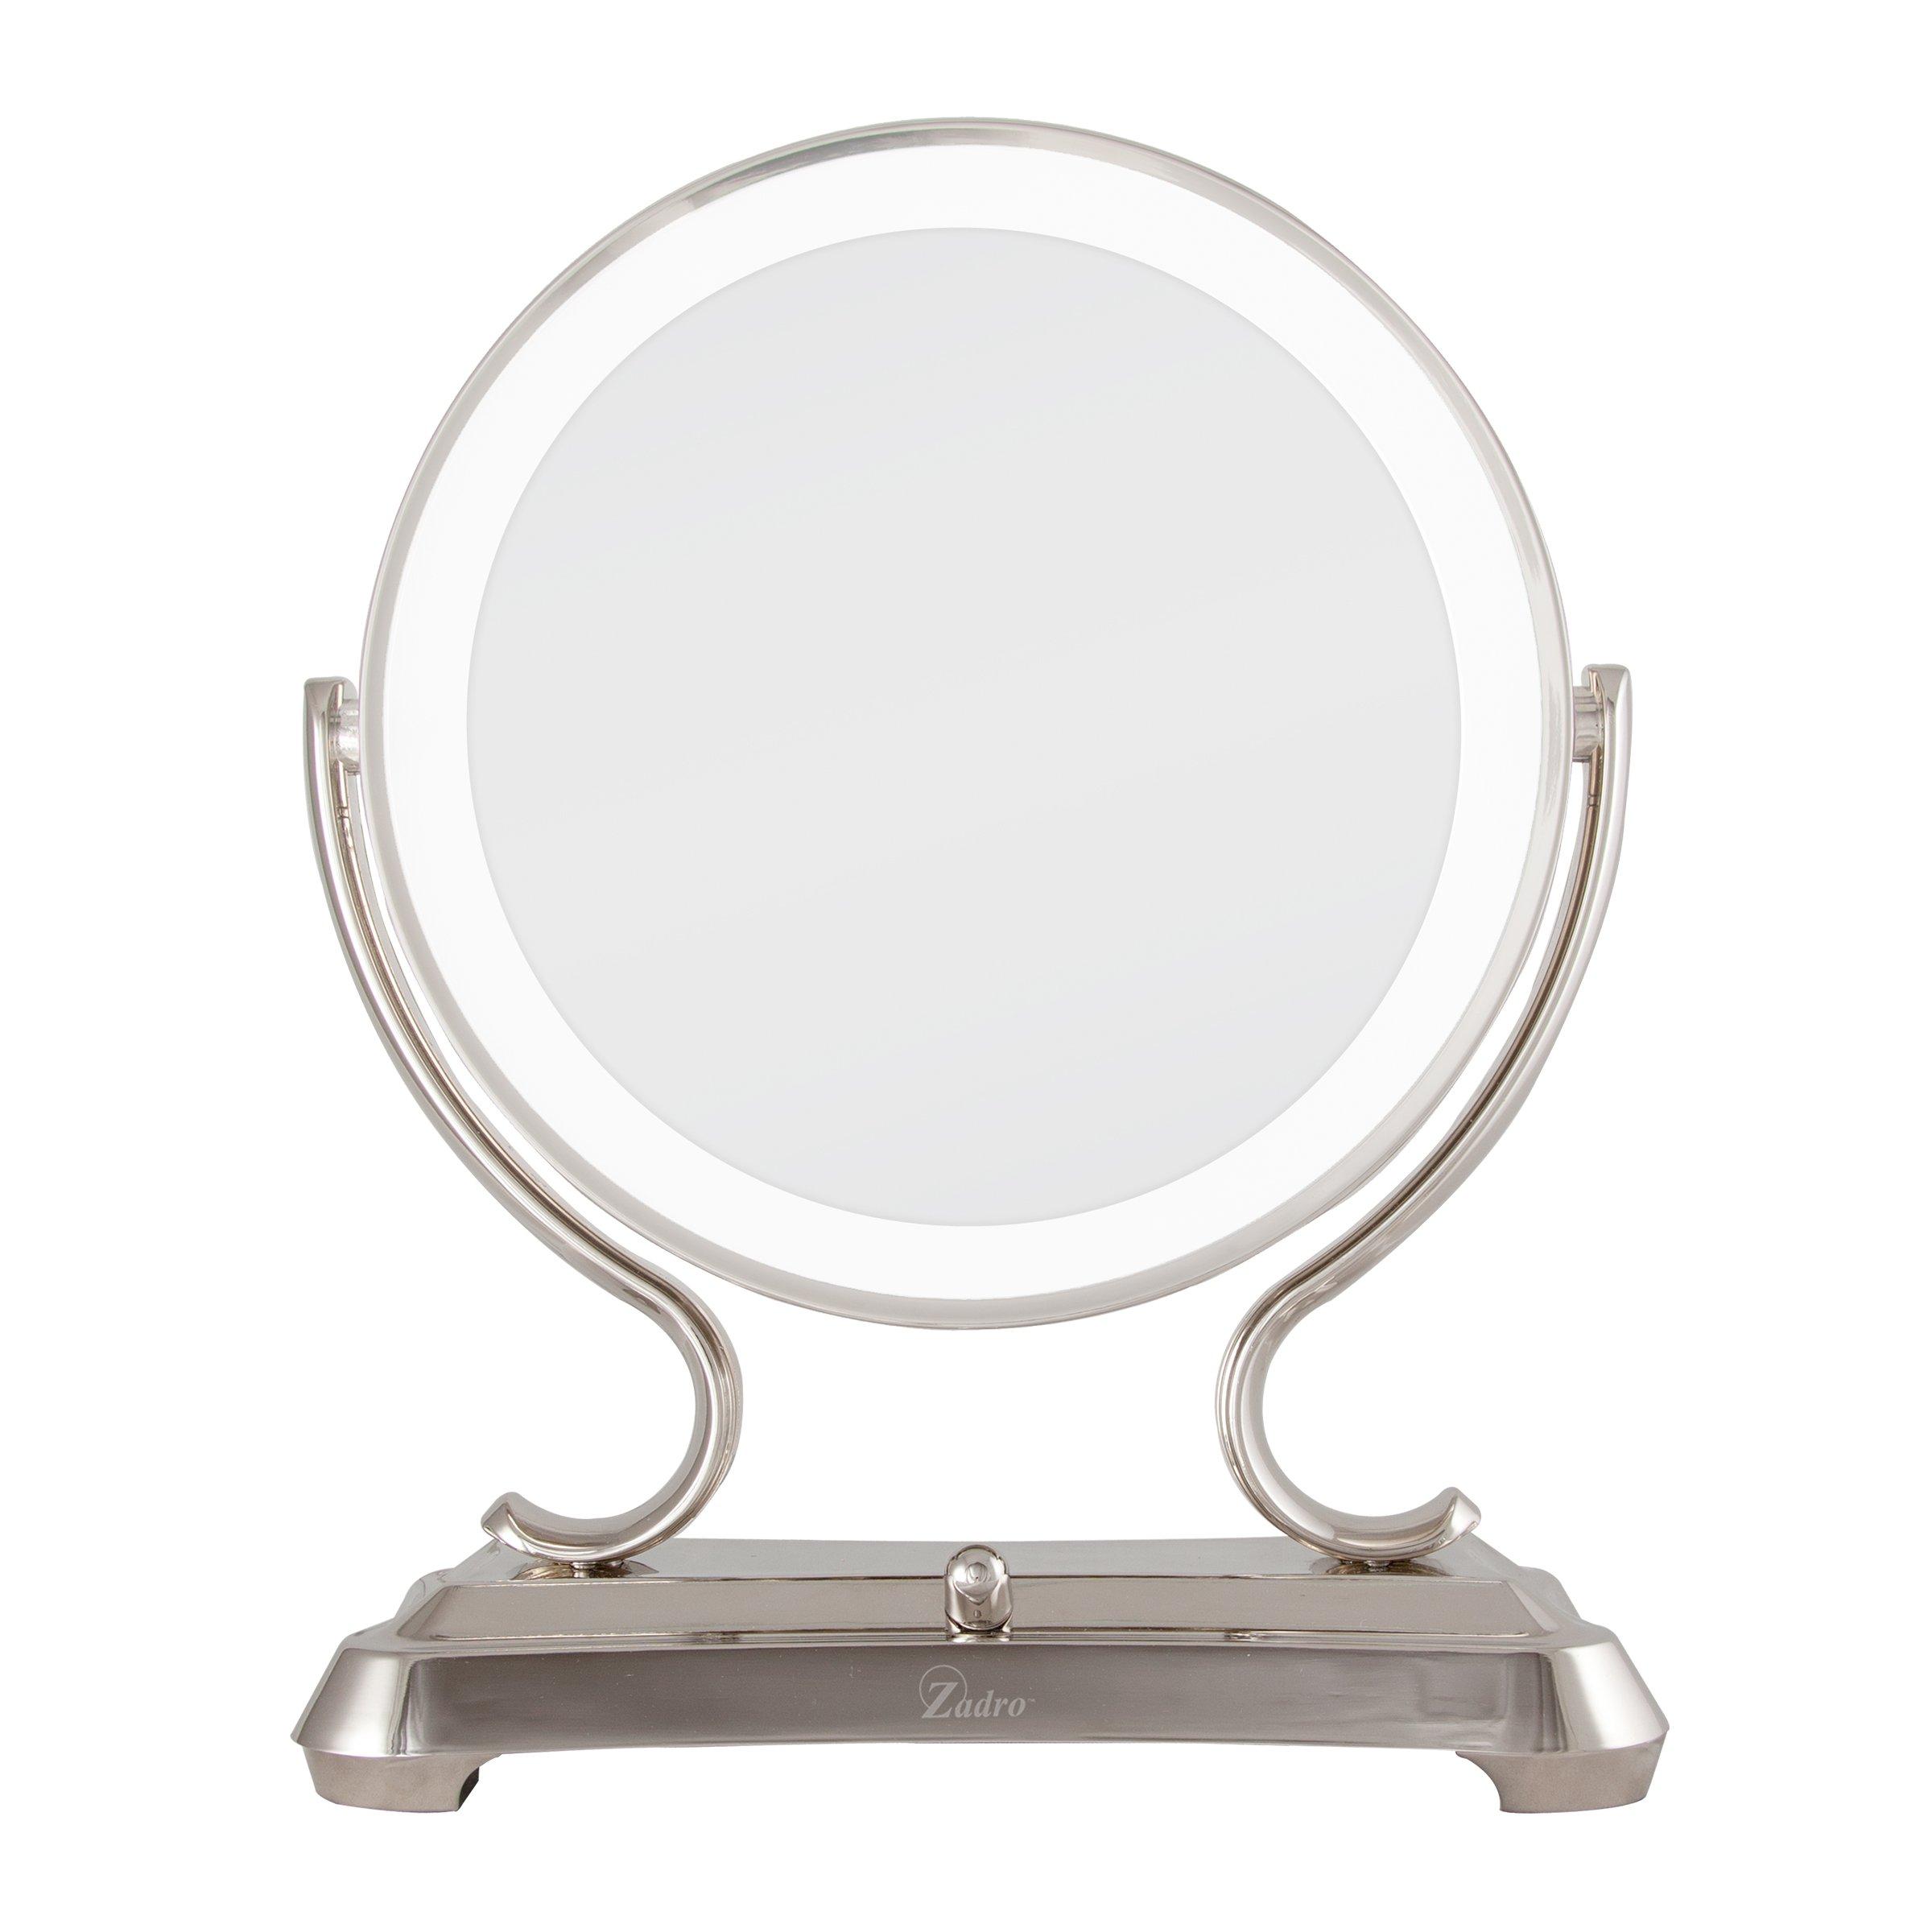 Buy Zadro Surround Light Dimmable Sunlight Vanity Mirror